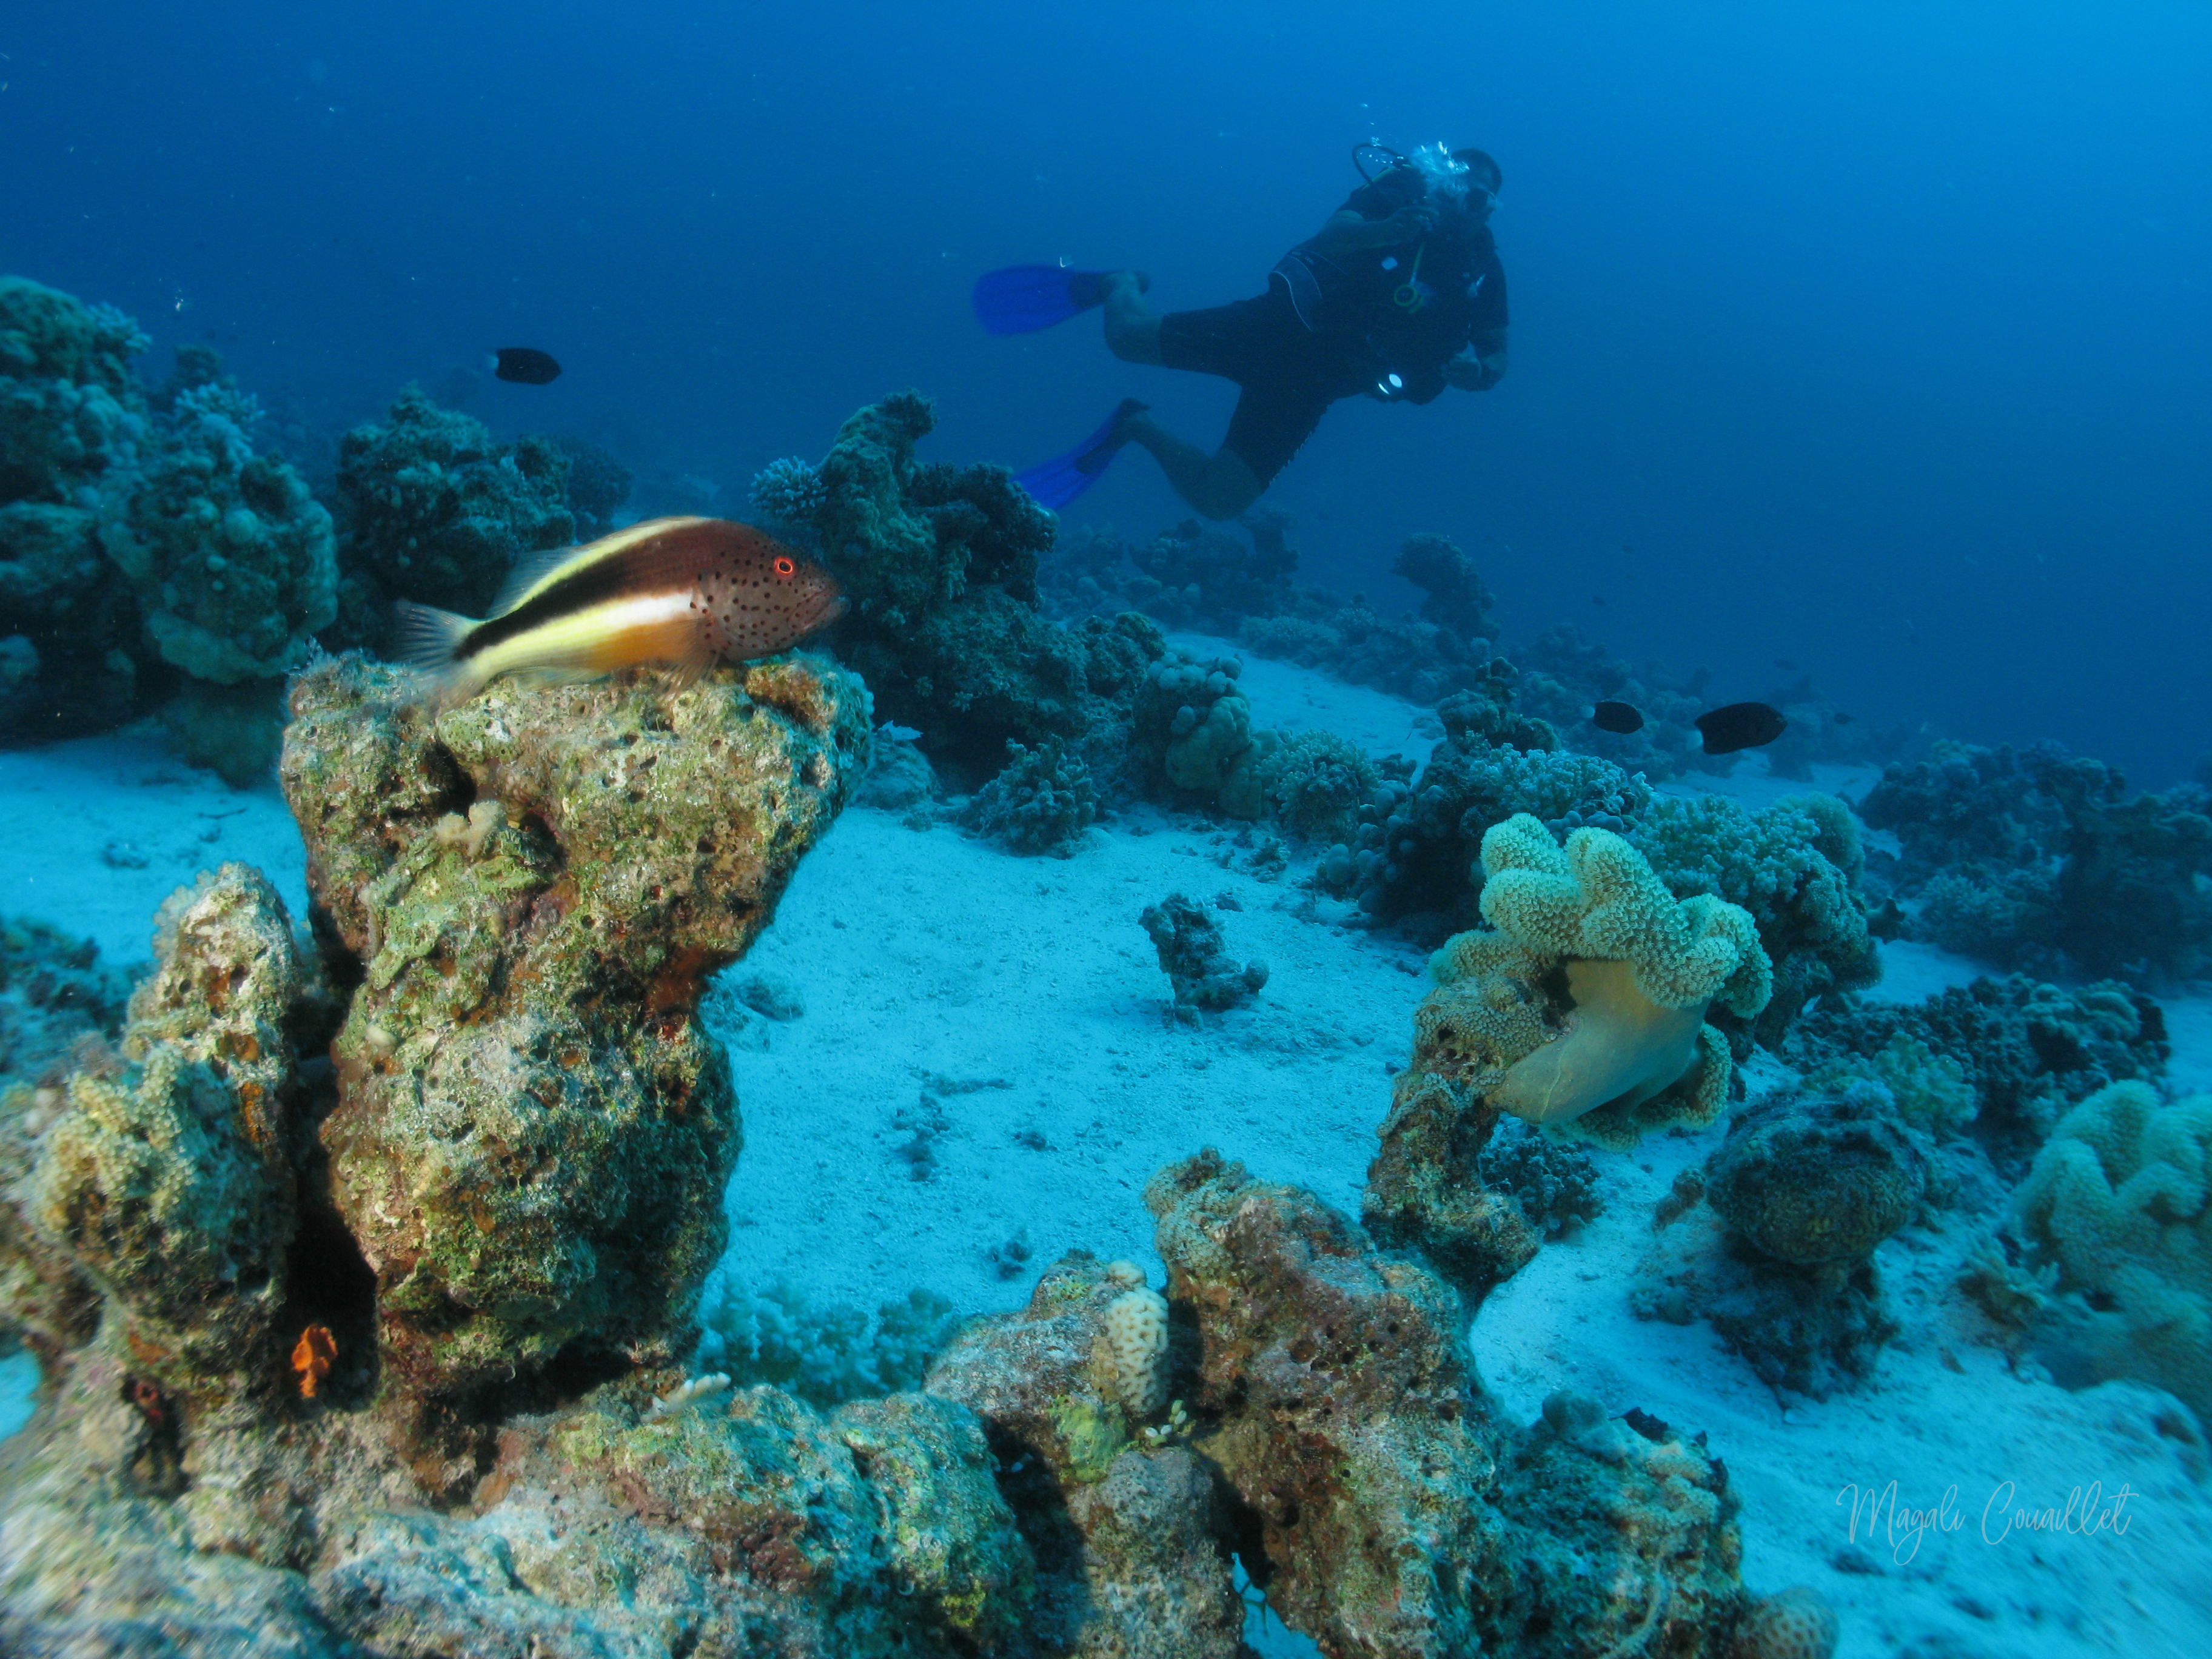 Poisson épervier - Hawk fish